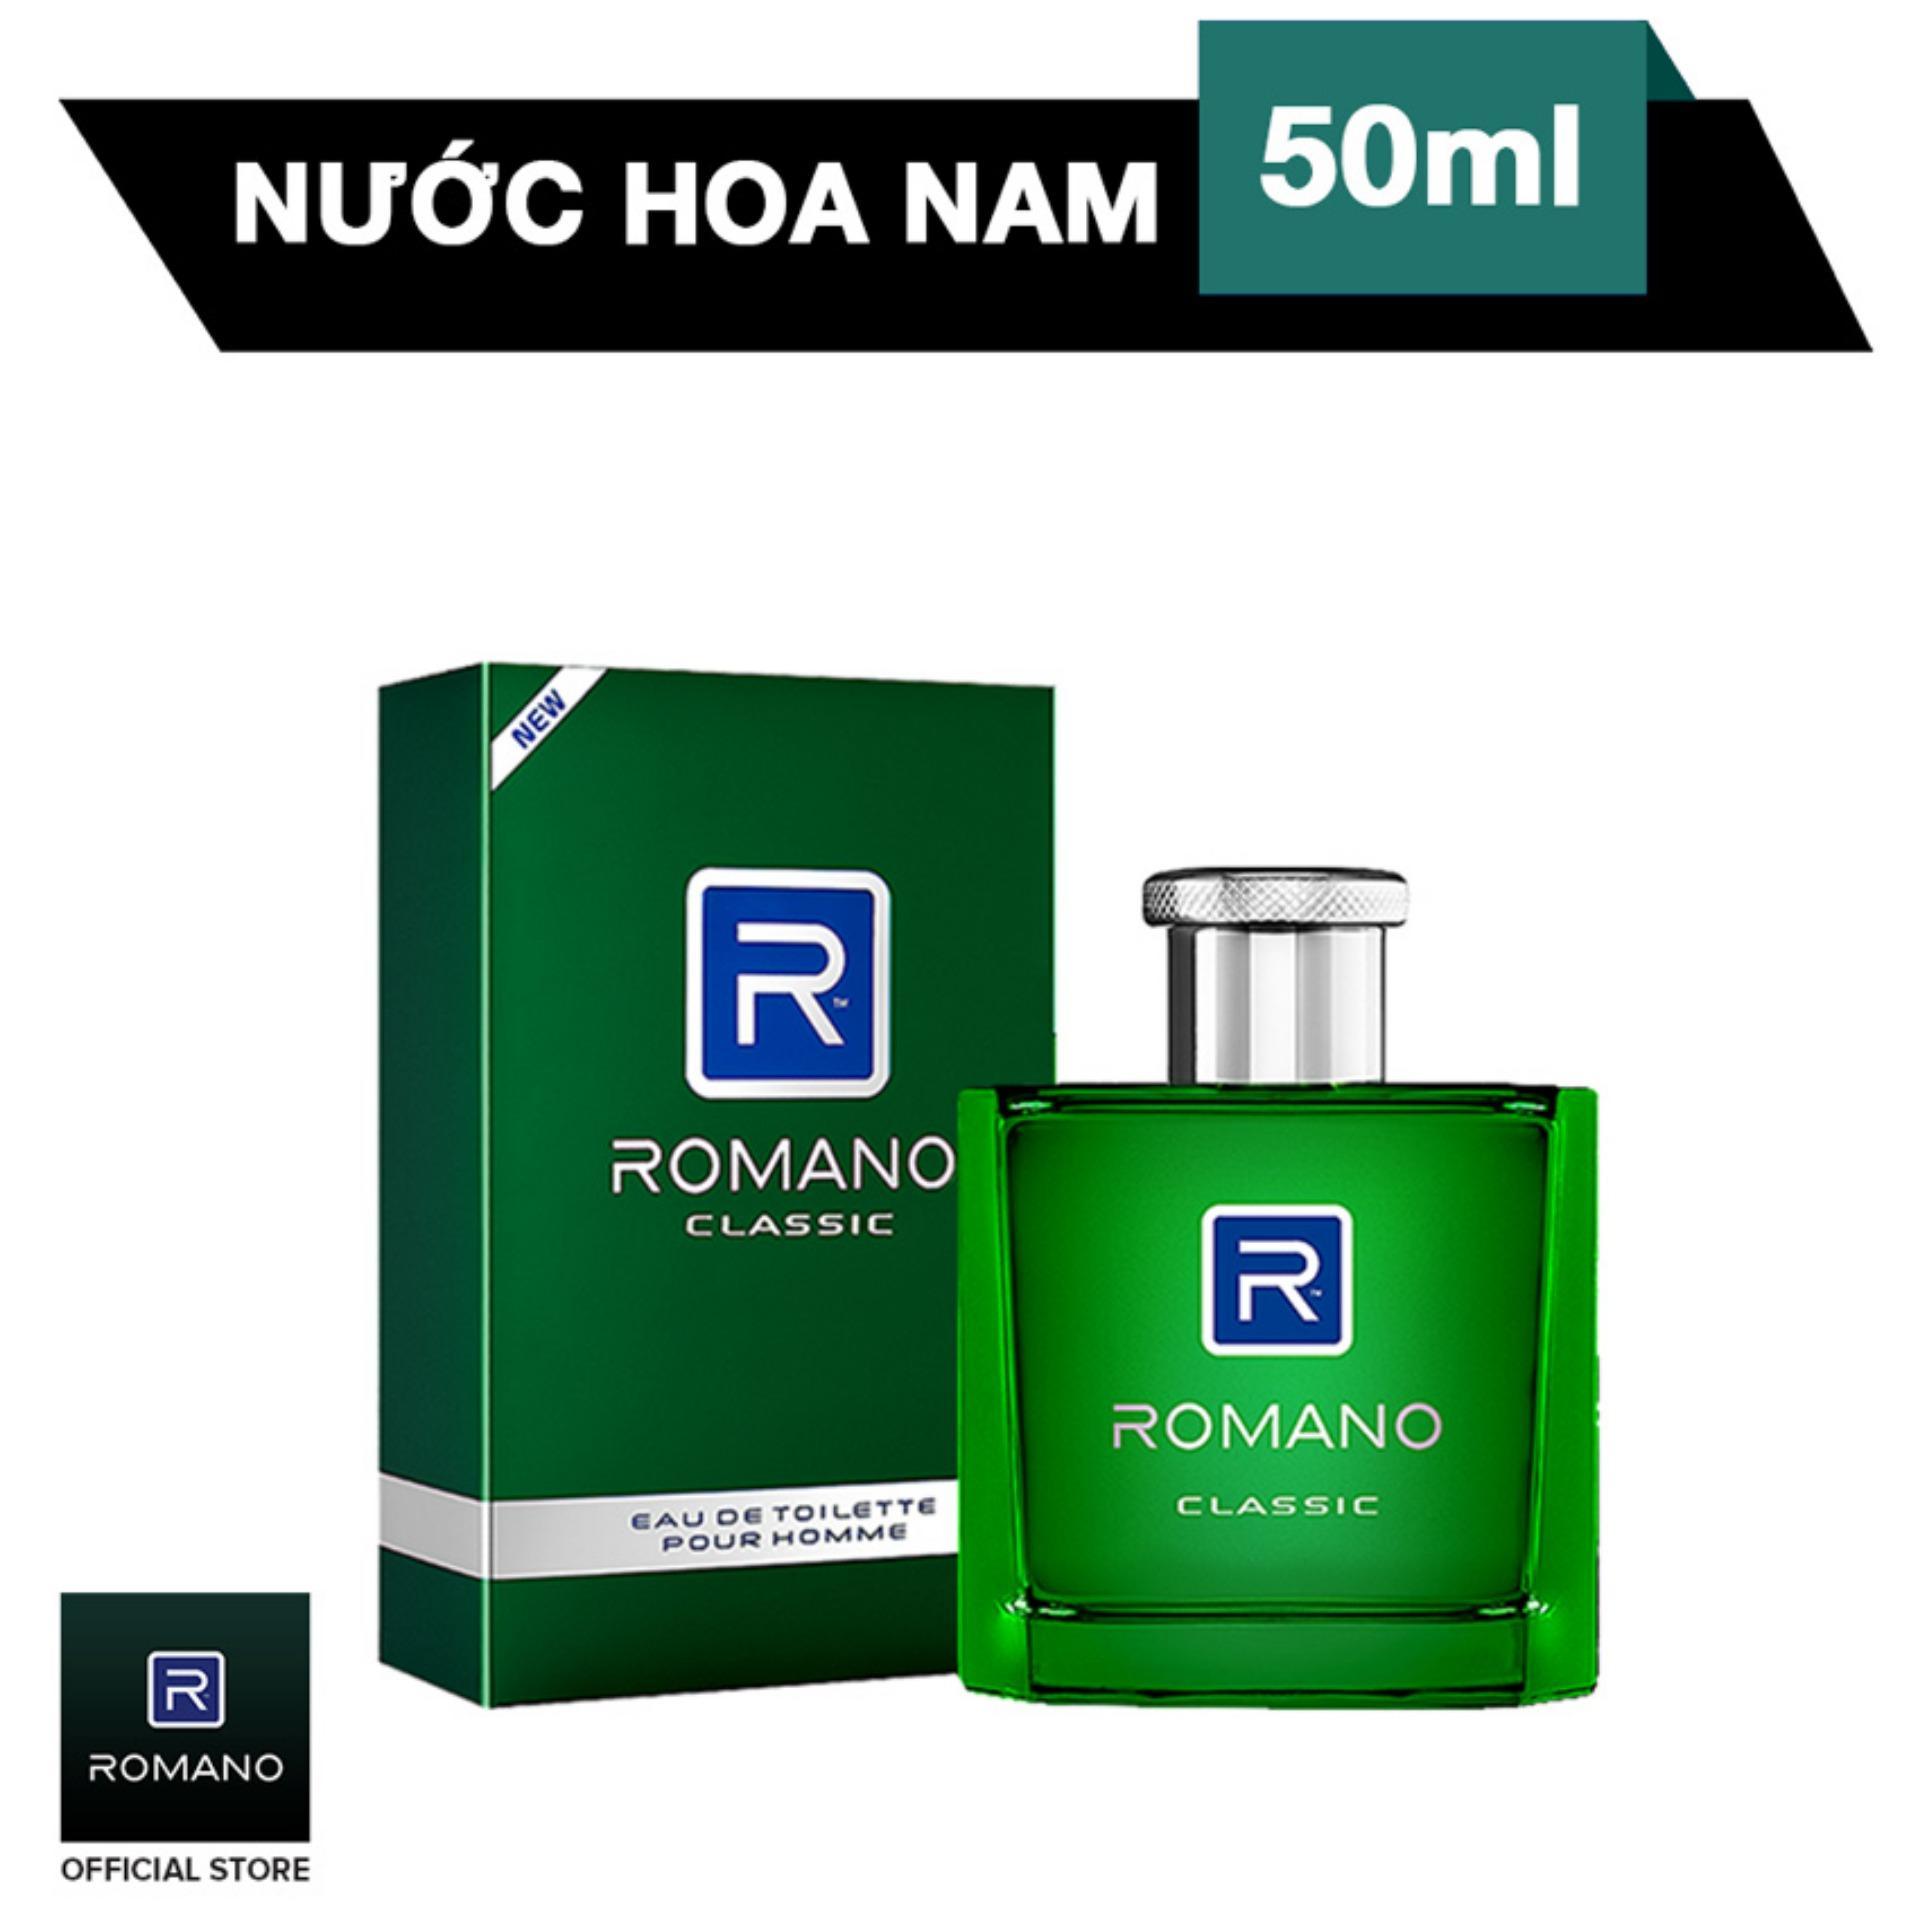 Romano nước hoa cao cấp Classic 50ml